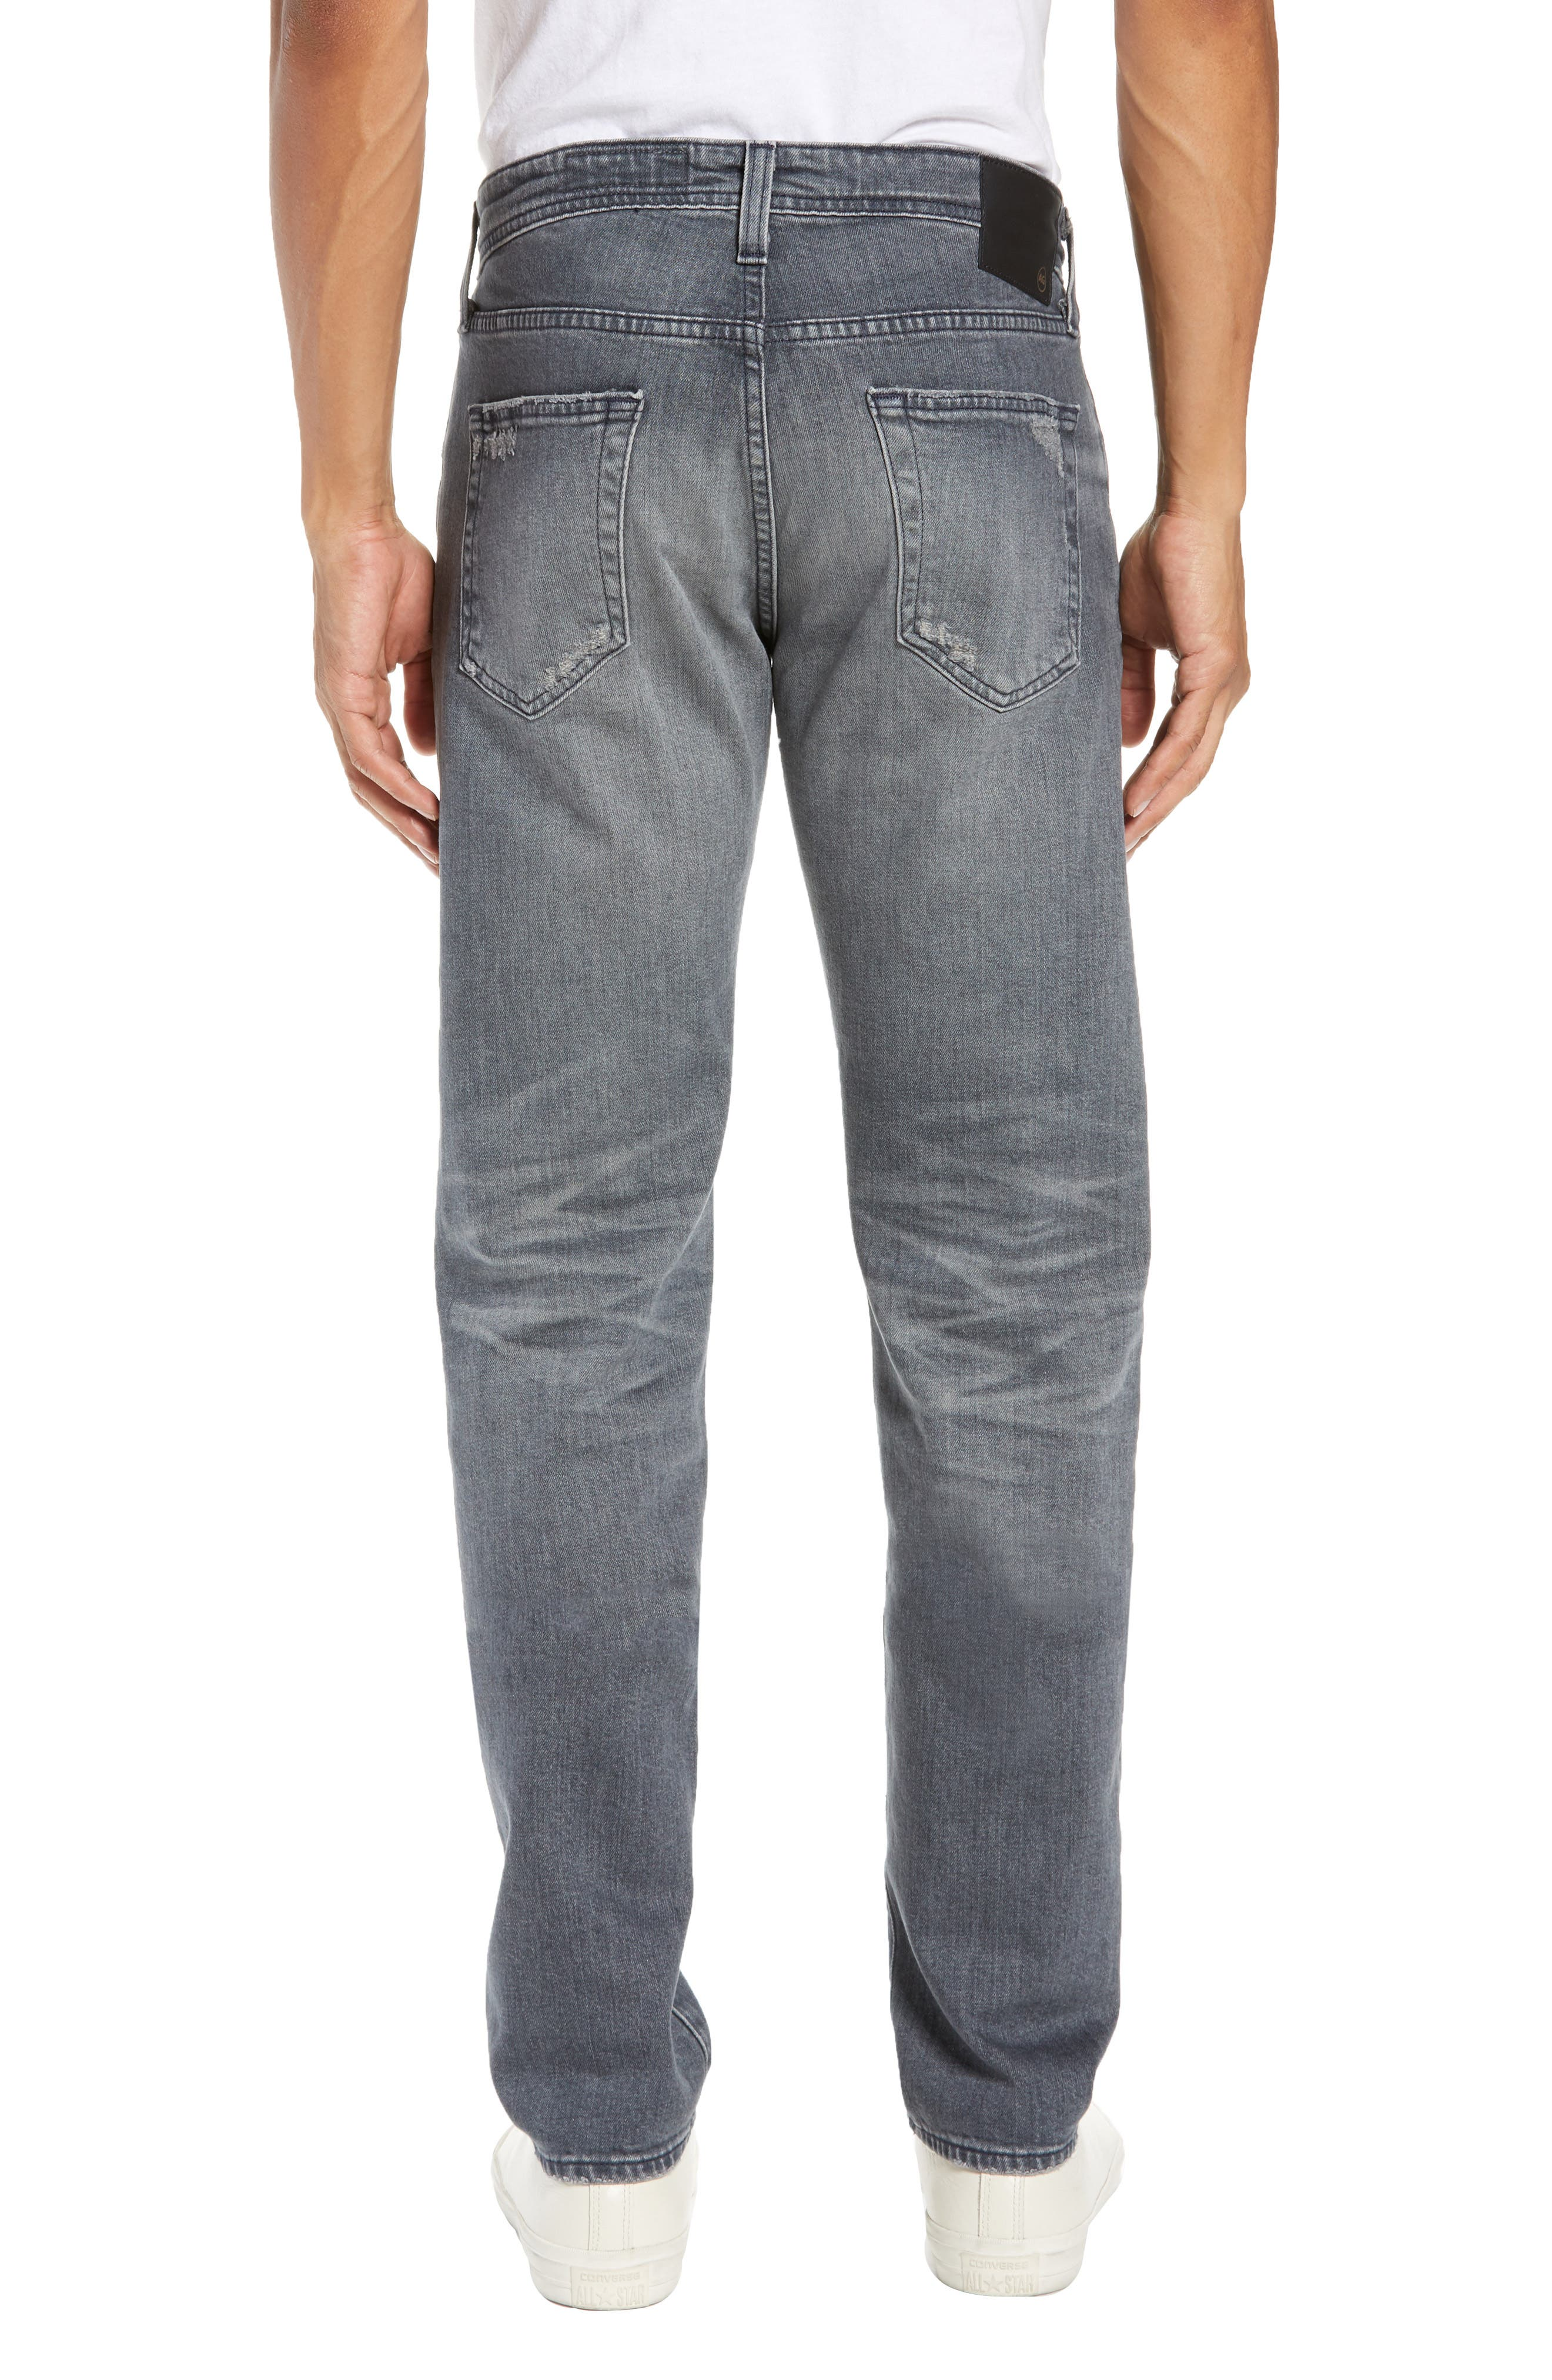 Tellis Slim Fit Jeans,                             Alternate thumbnail 2, color,                             8 YEARS CONJURE